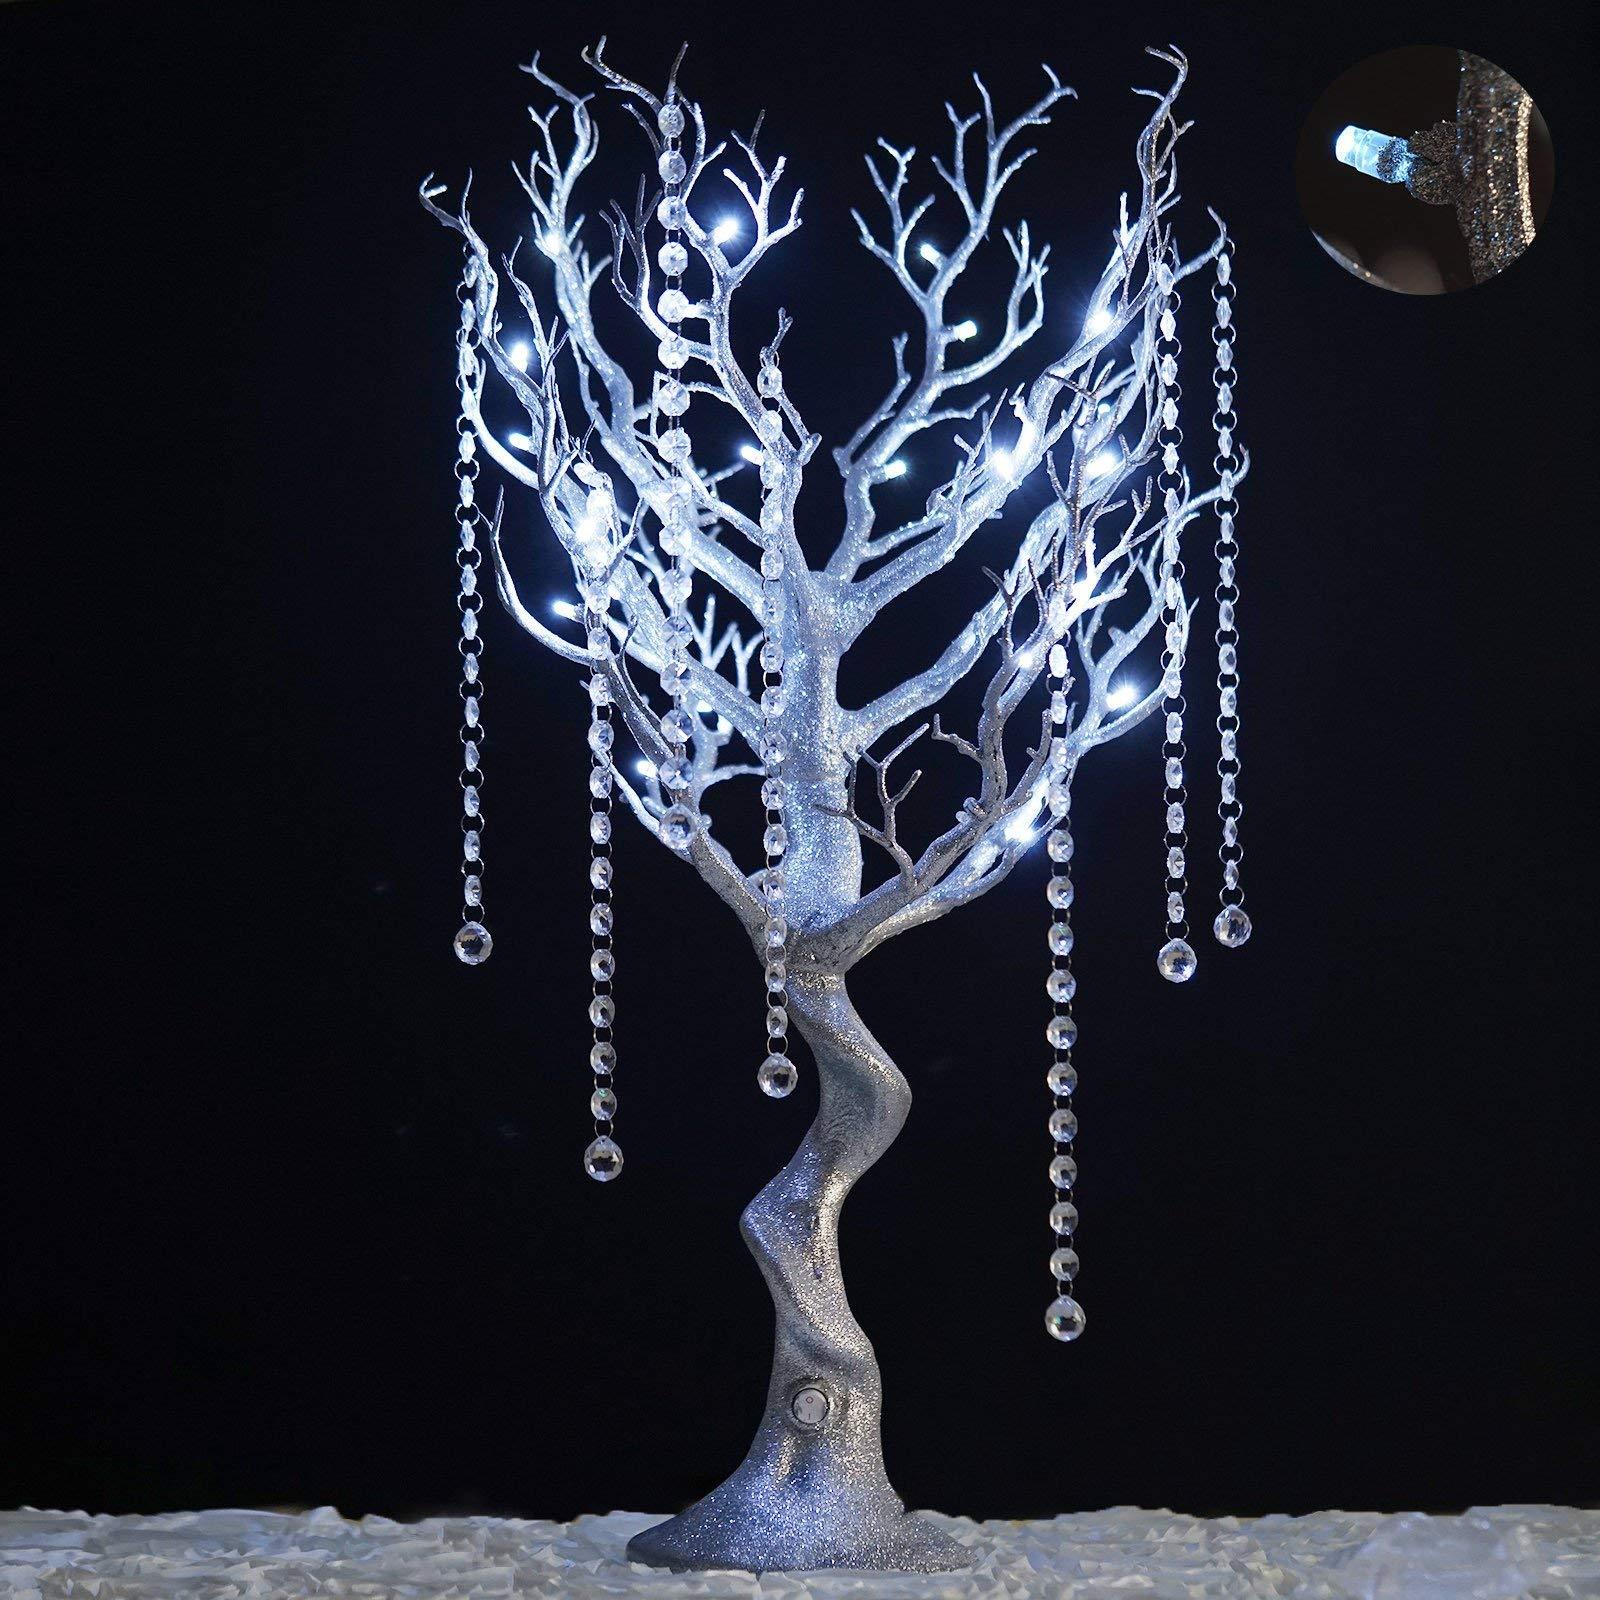 Efavormart 30'' Tall Glitter Silver Manzanita Tree Centerpiece for Wedding Centerpiece Table Top Decoration W/LED Lights (Battery)